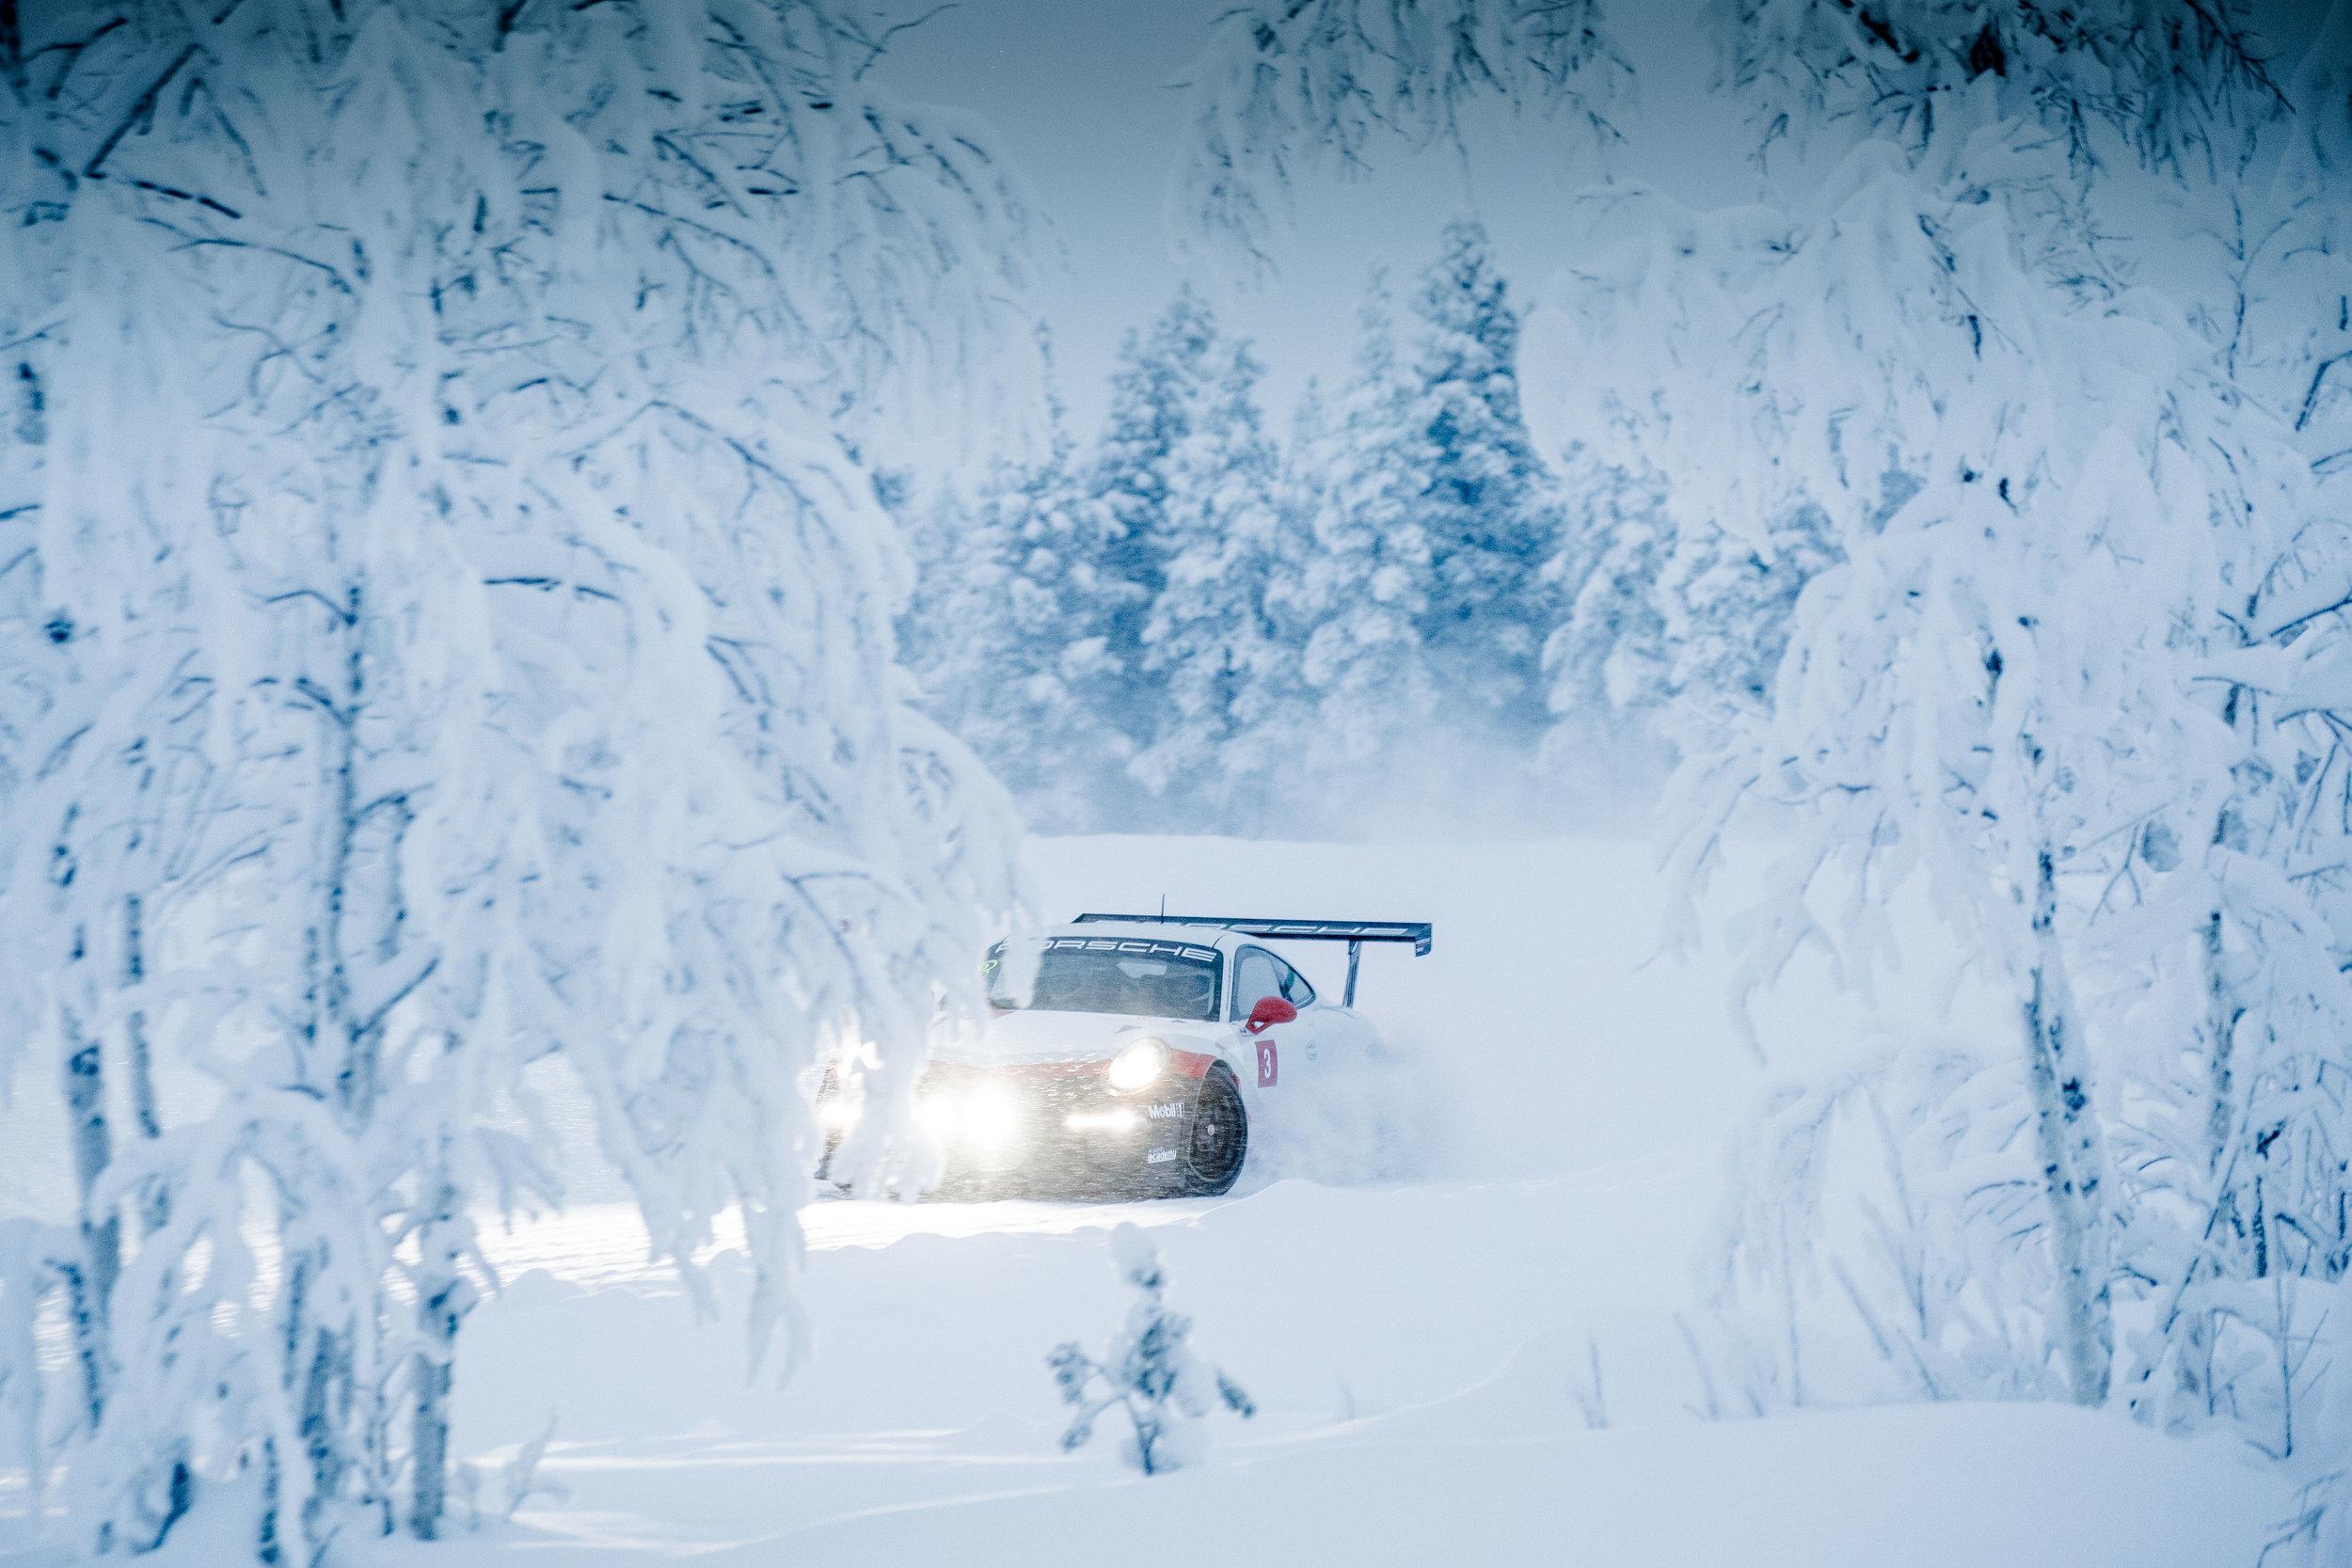 Porsche Ice Experience on Ice_30_01_2019_0209_175636.jpg